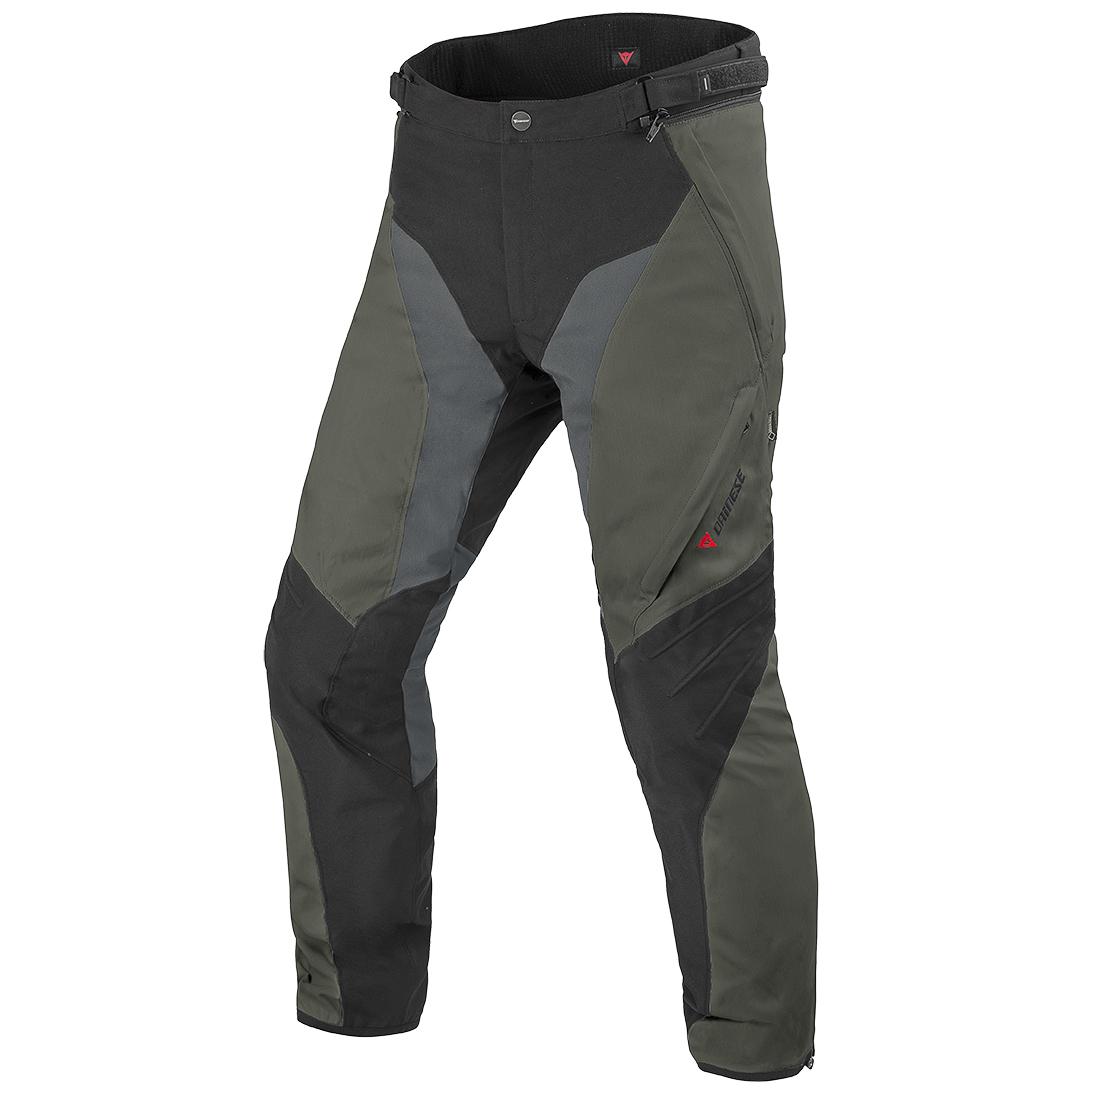 【DAINESE】P.TRAVELGUARD GORE-TEX車褲 - 「Webike-摩托百貨」